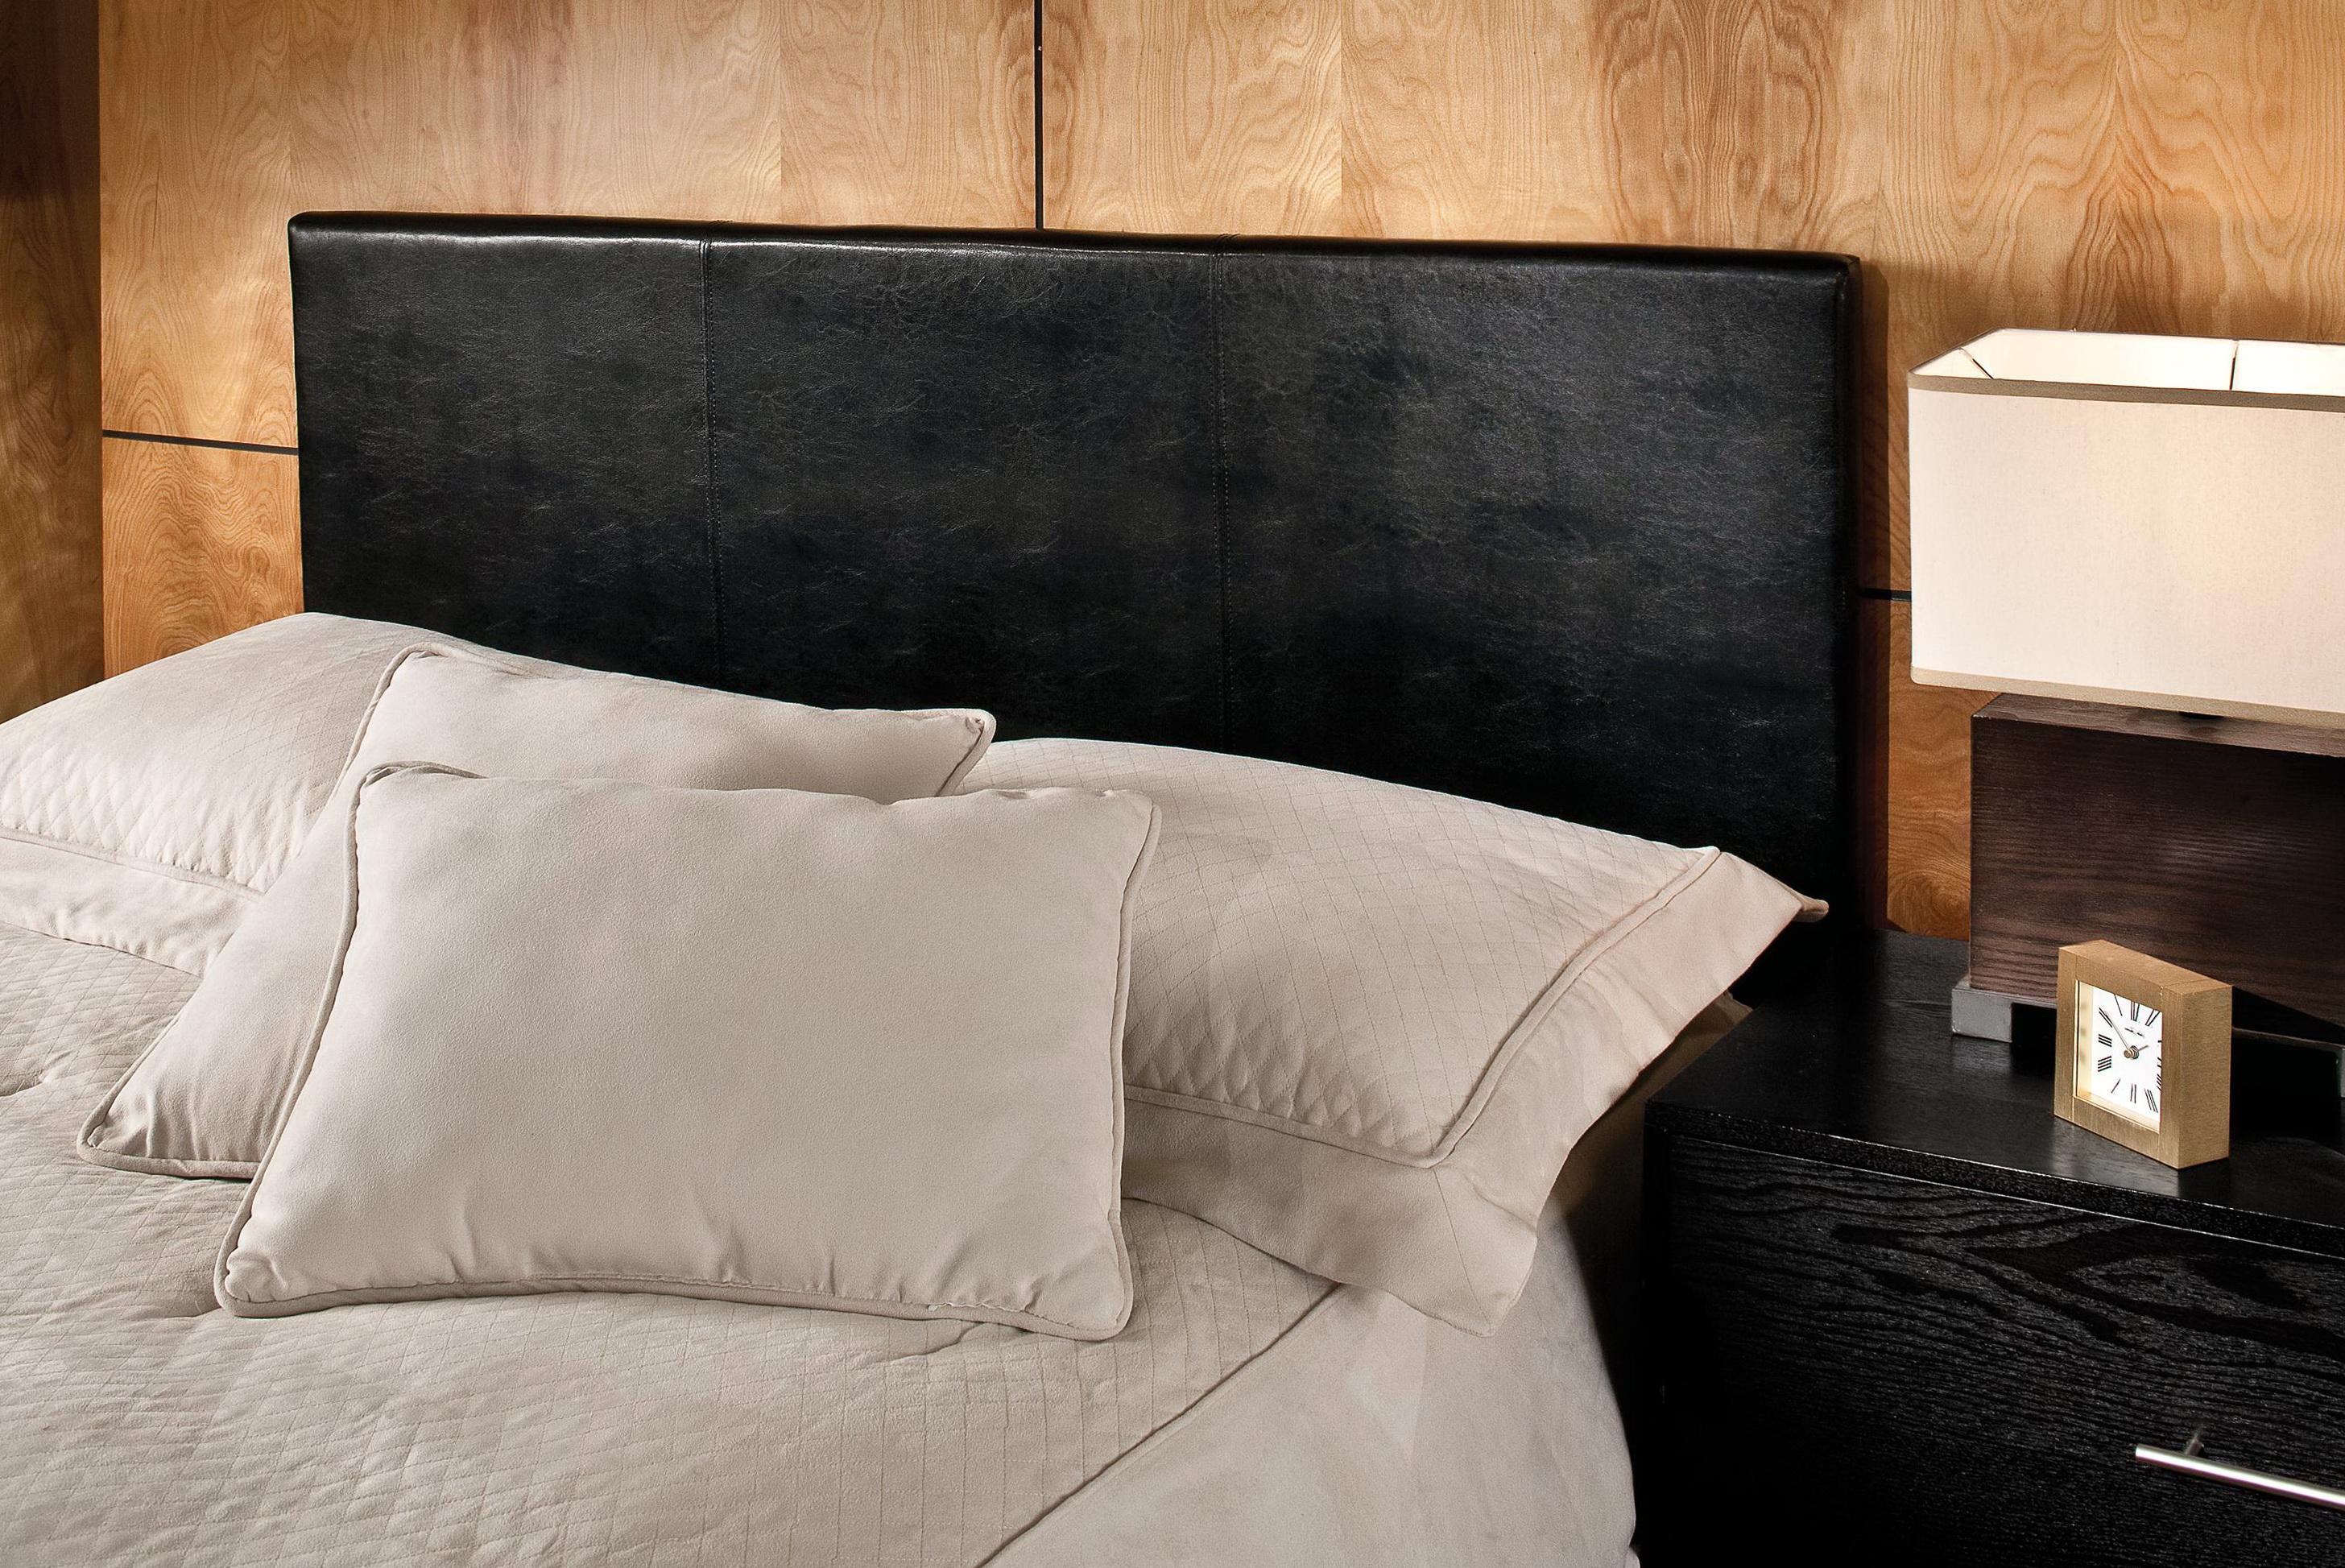 baxton studio stella crystal tufted black modern queen bed w